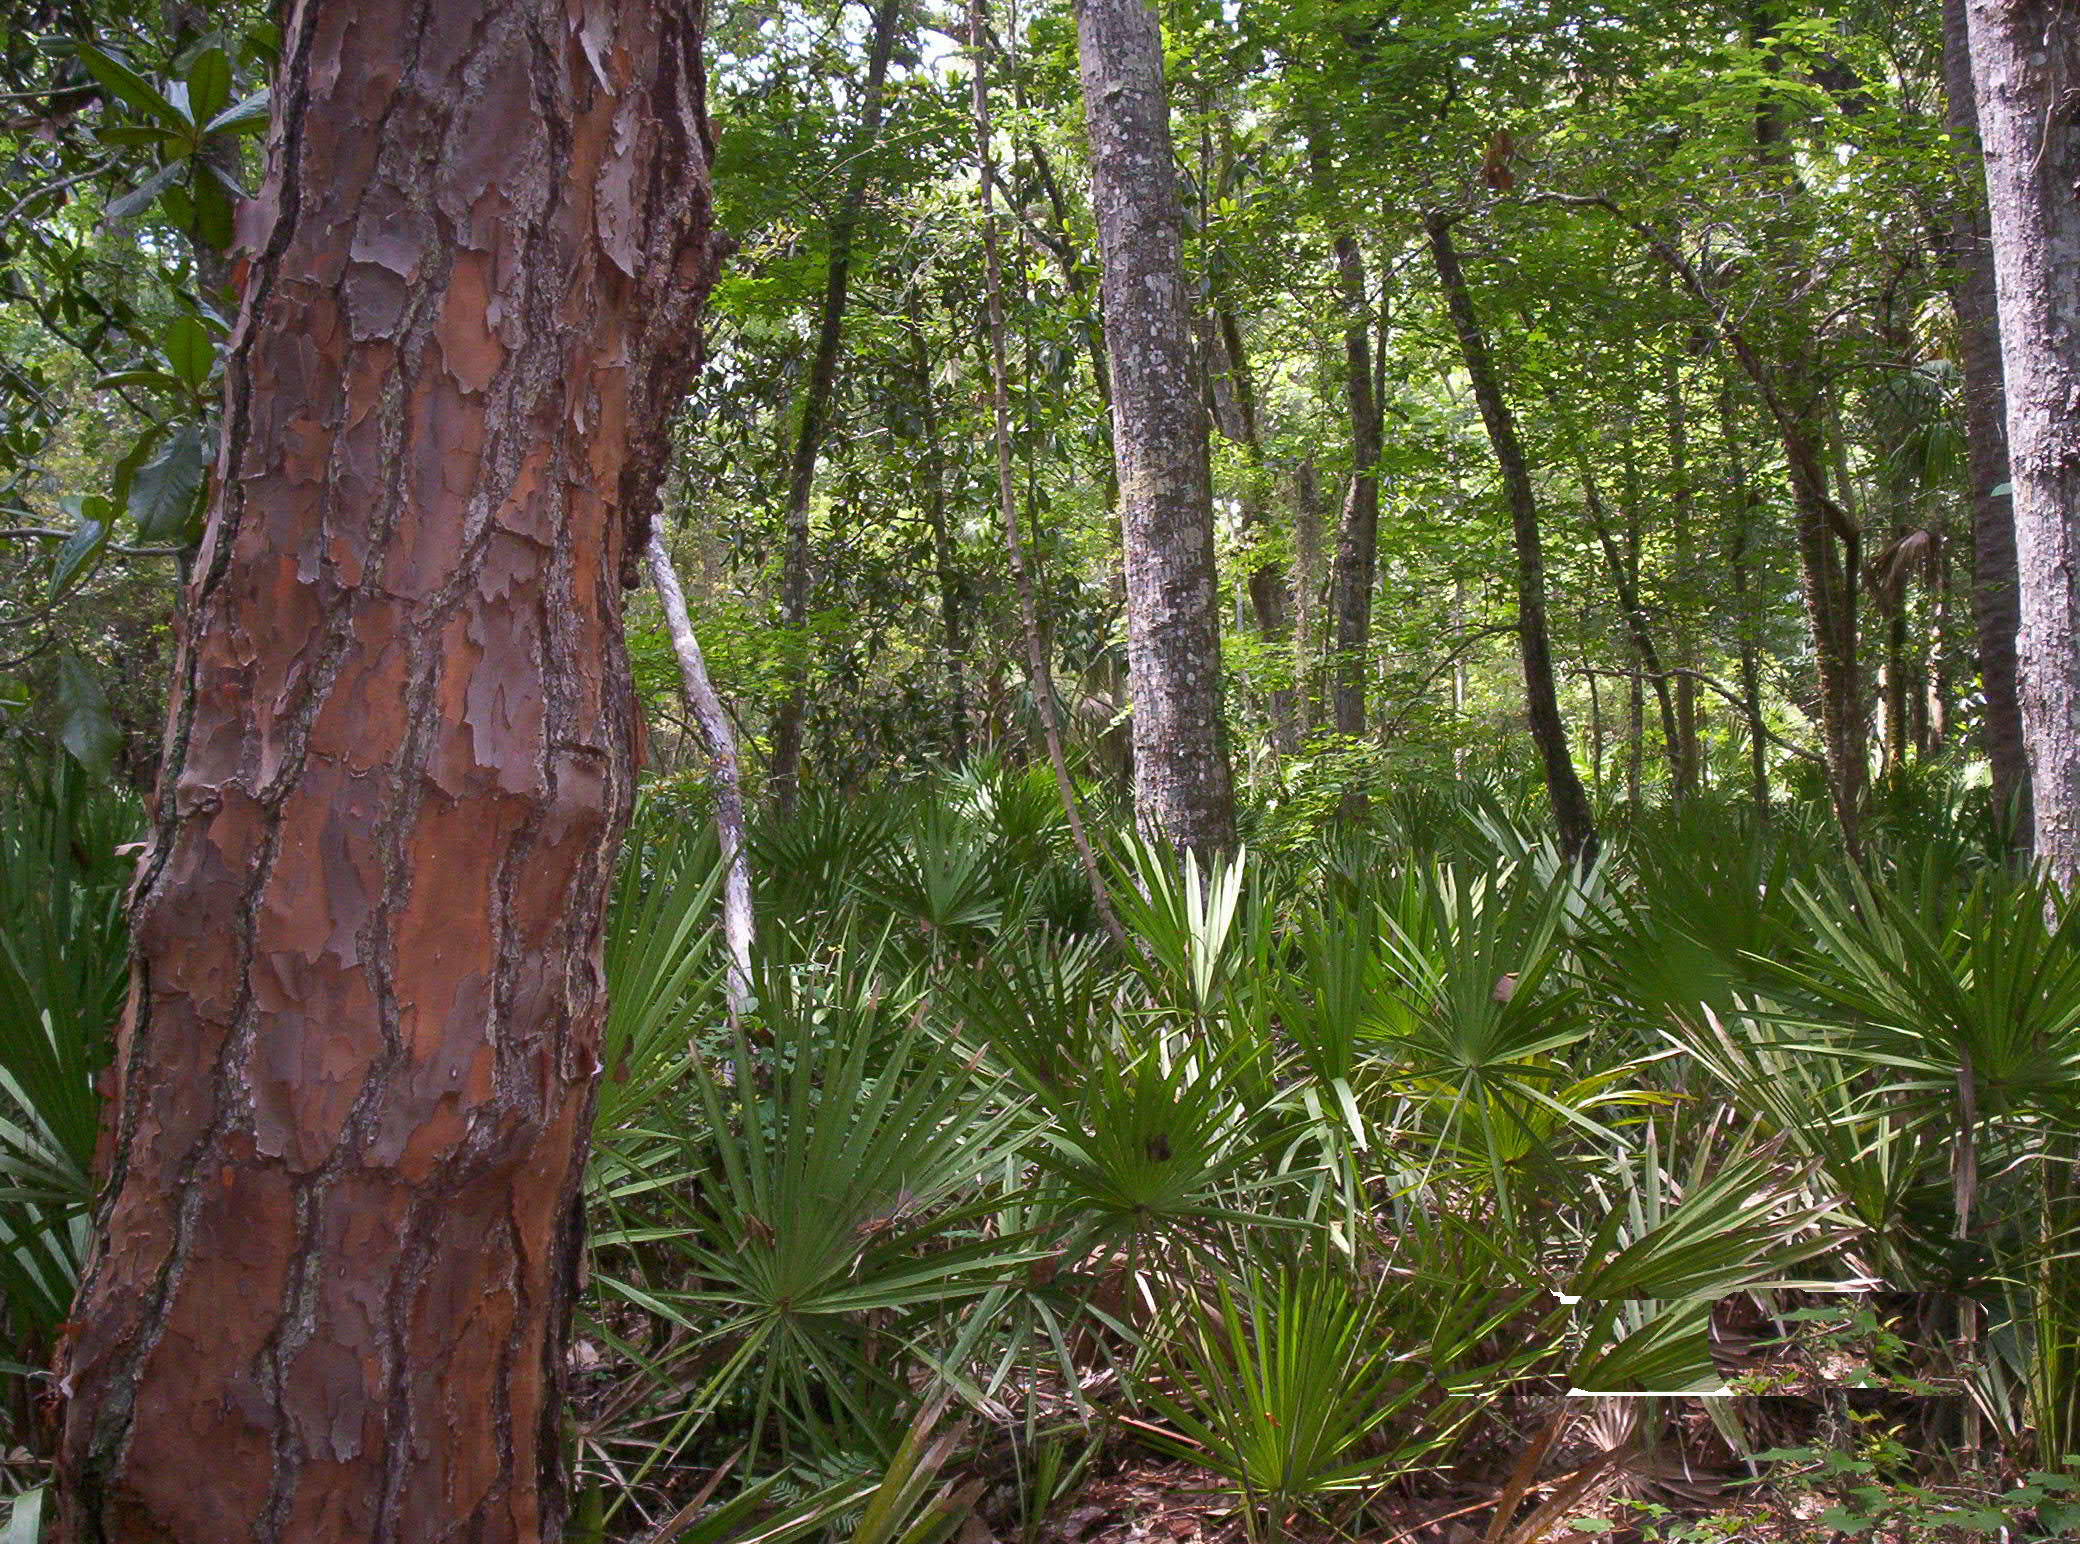 487 acres of riverine habitat restored and preserved